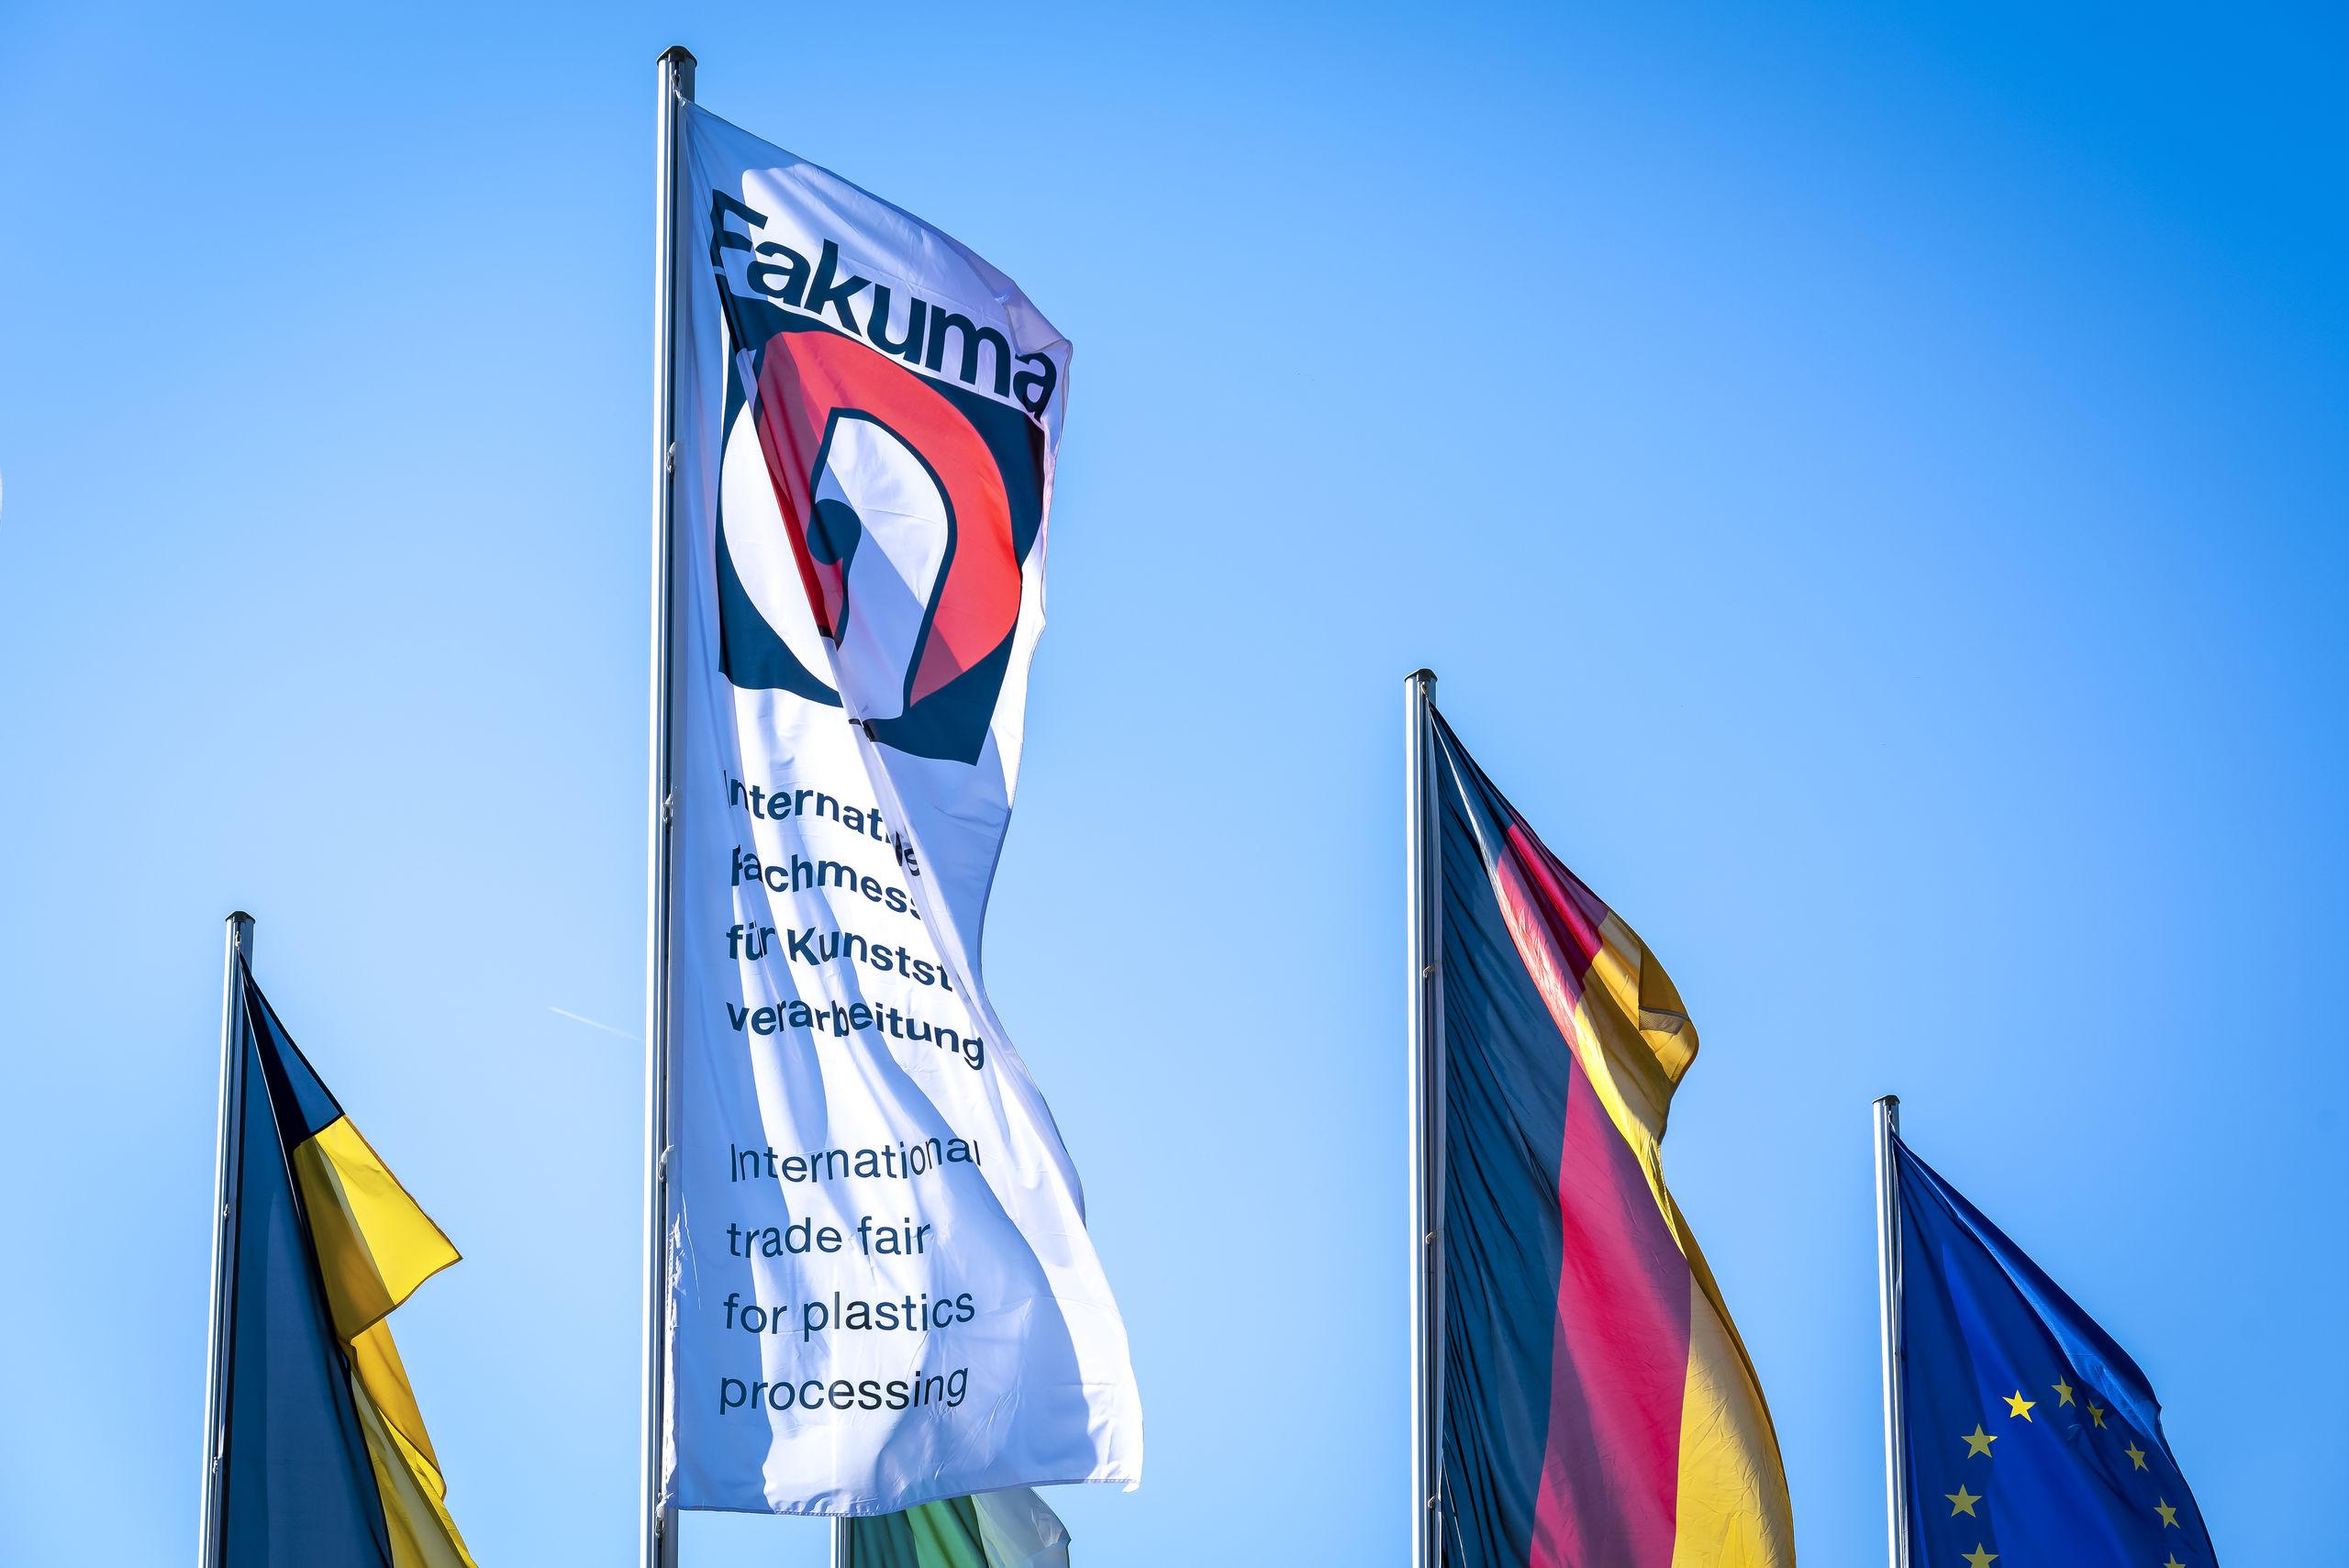 Foto: Fakuma / P. E. Schall GmbH & Co. KG